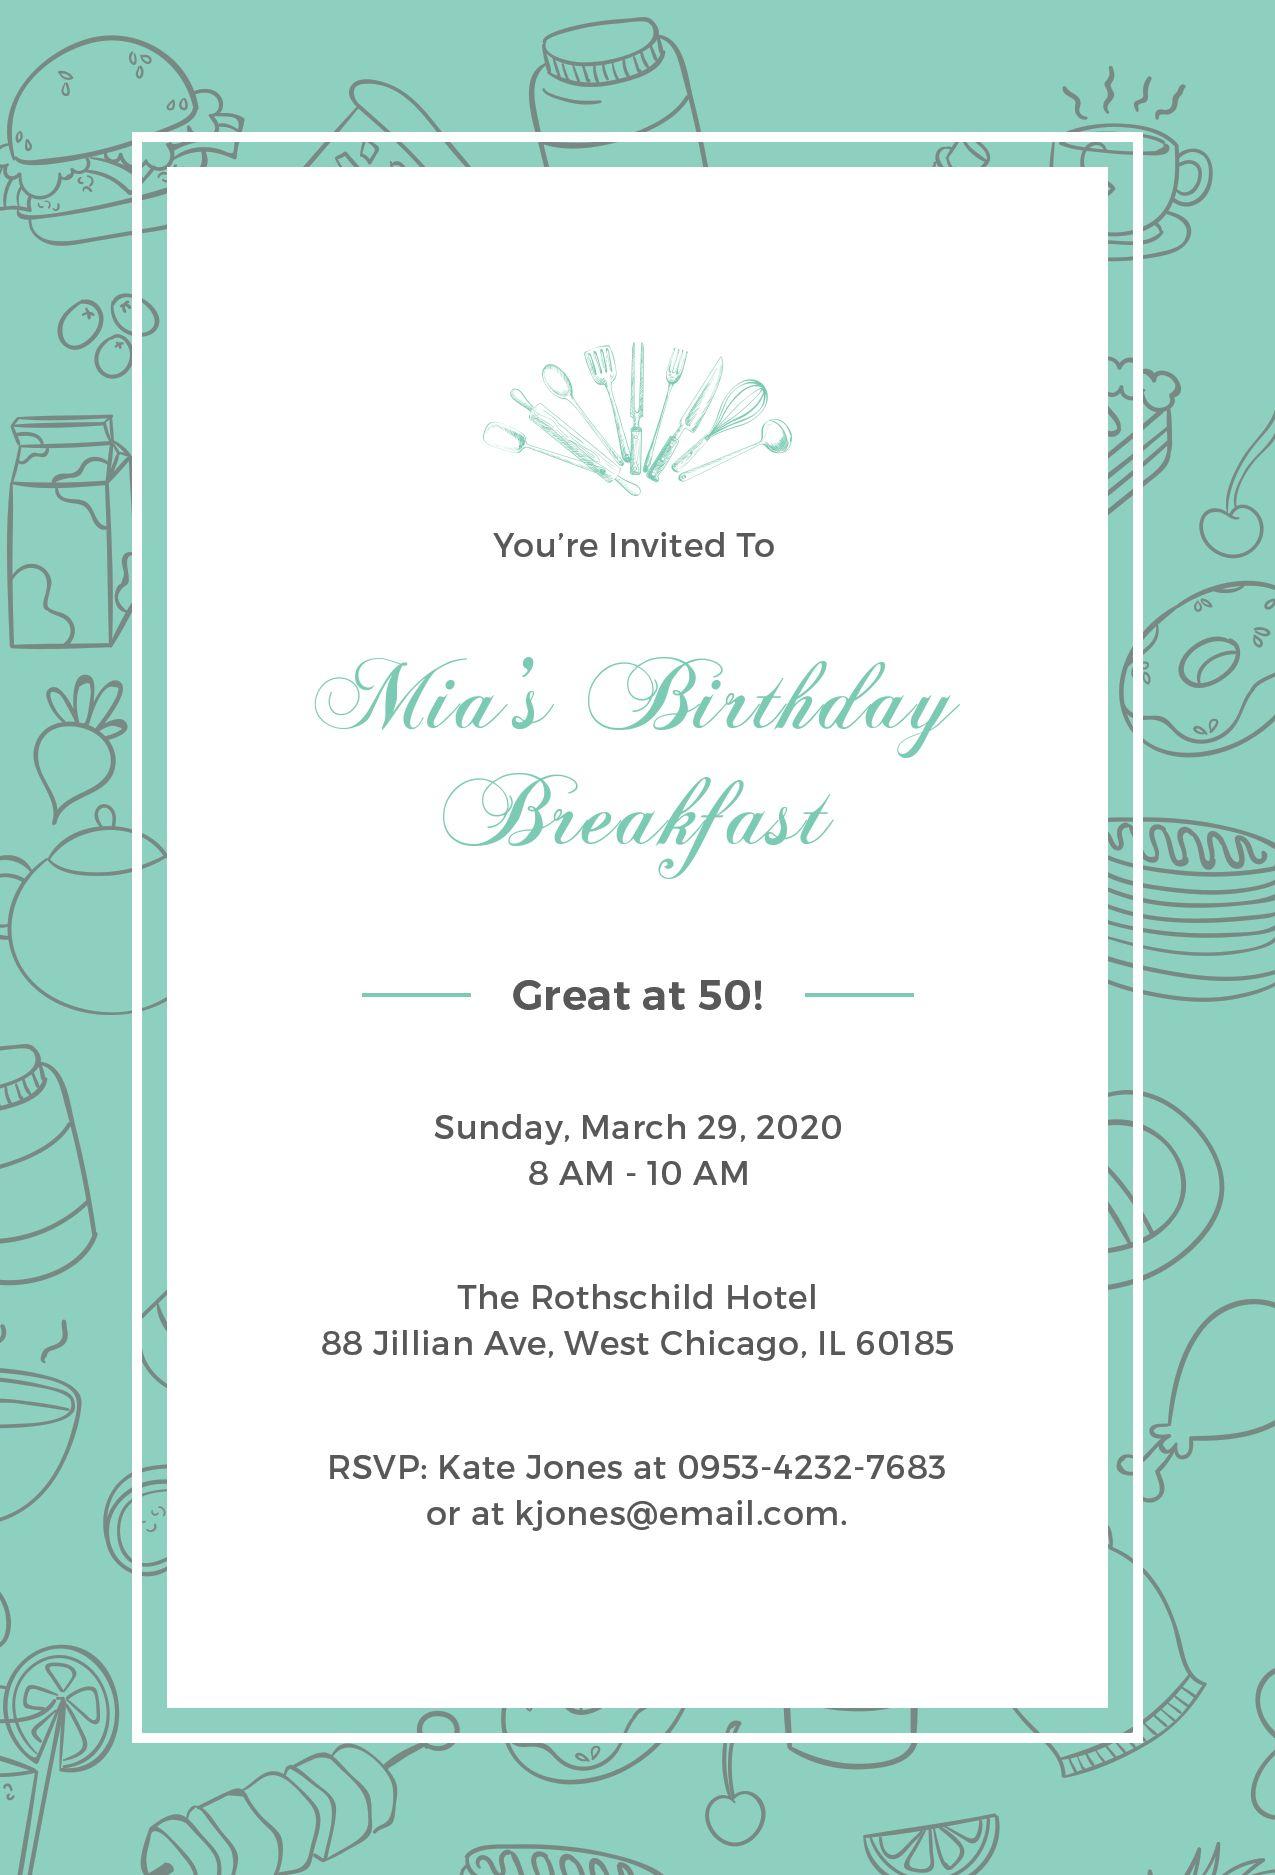 FREE Birthday Breakfast Invitation Template - Word  PSD